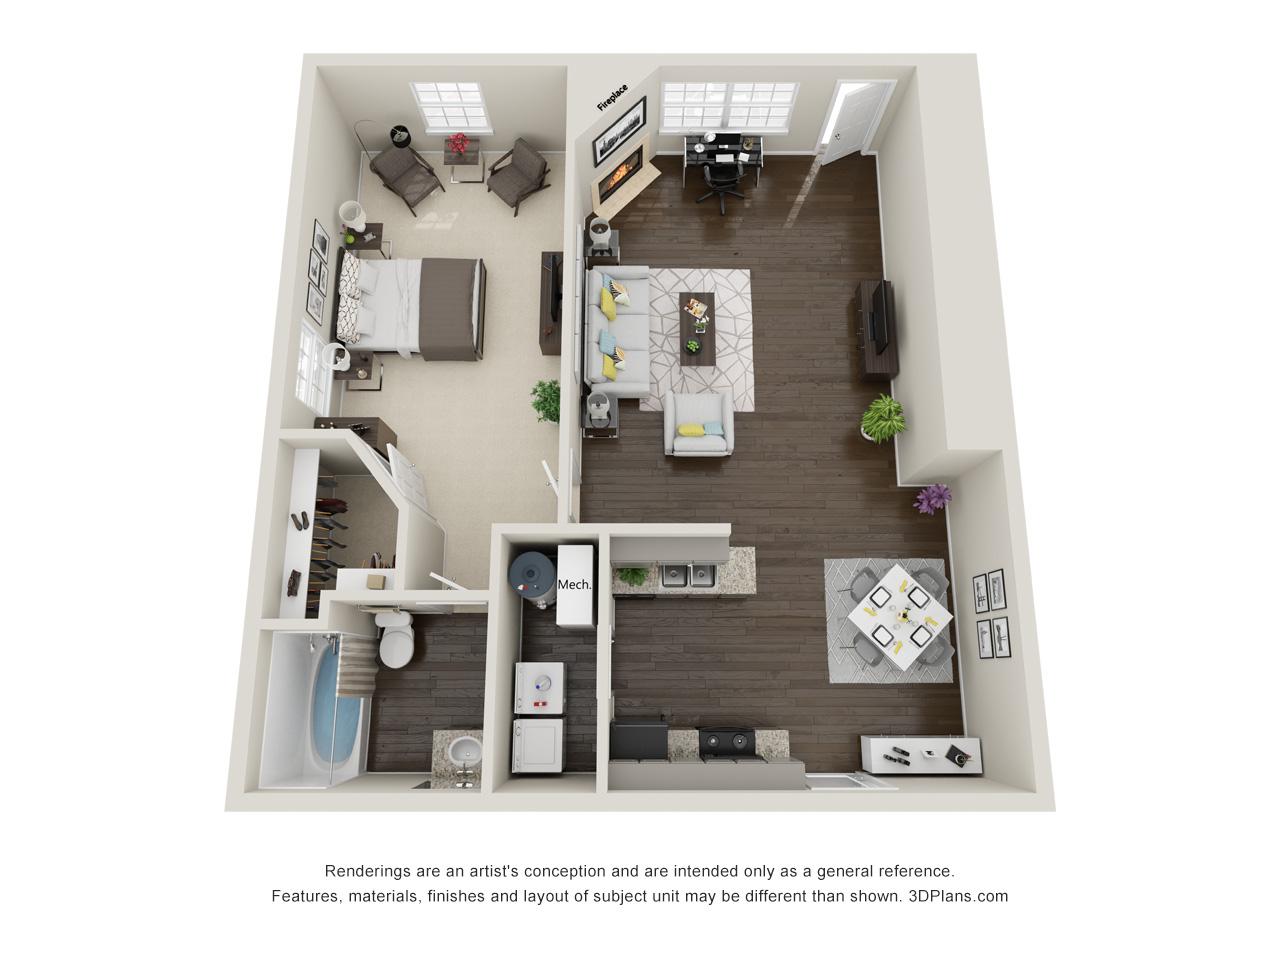 Tall Oaks Apartments and Villas - Floorplan - Post Oak Apartment